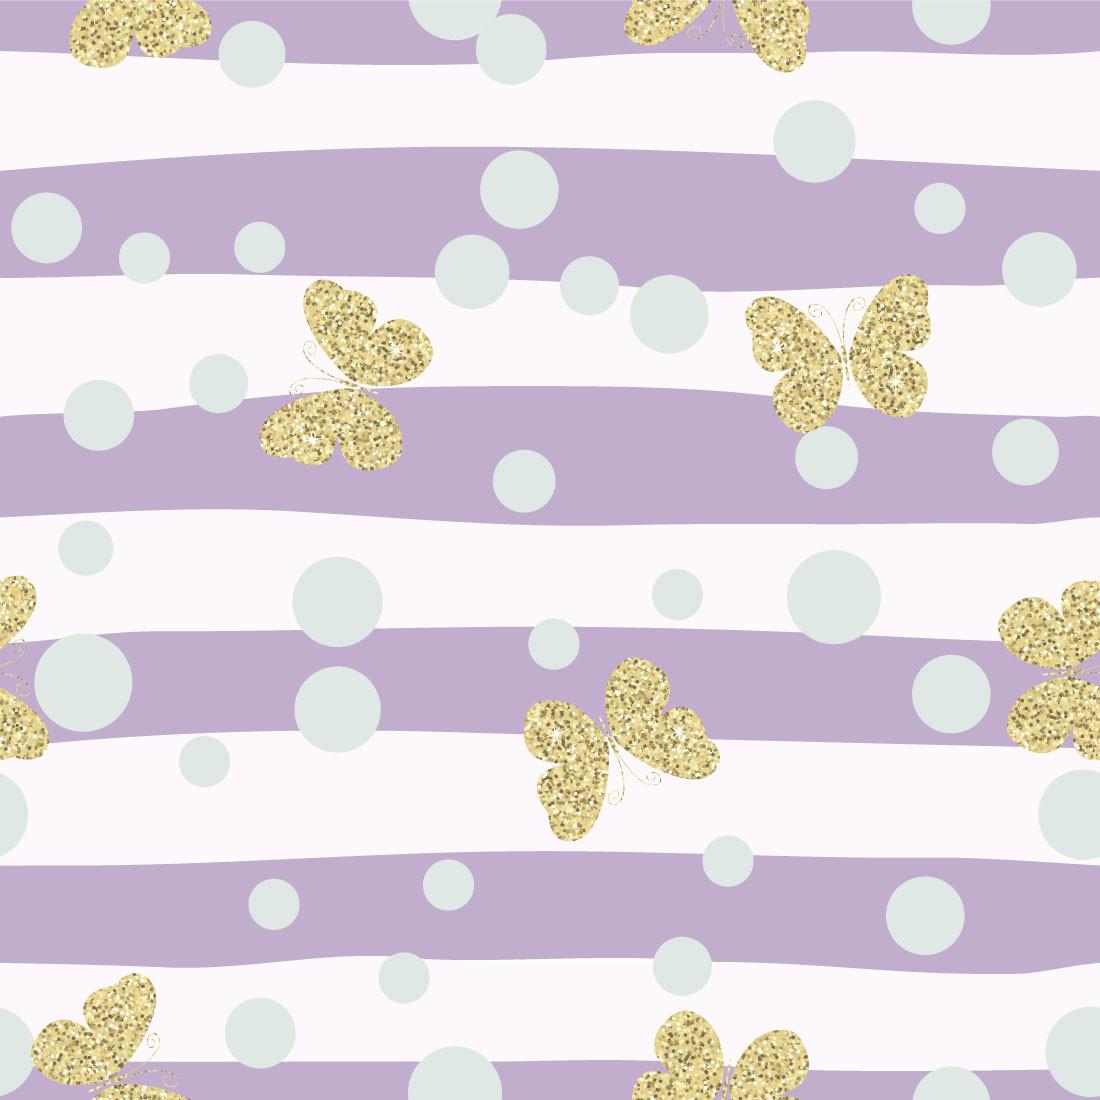 Papel de Parede Listras Irregulares Lilás Borboletas Gold